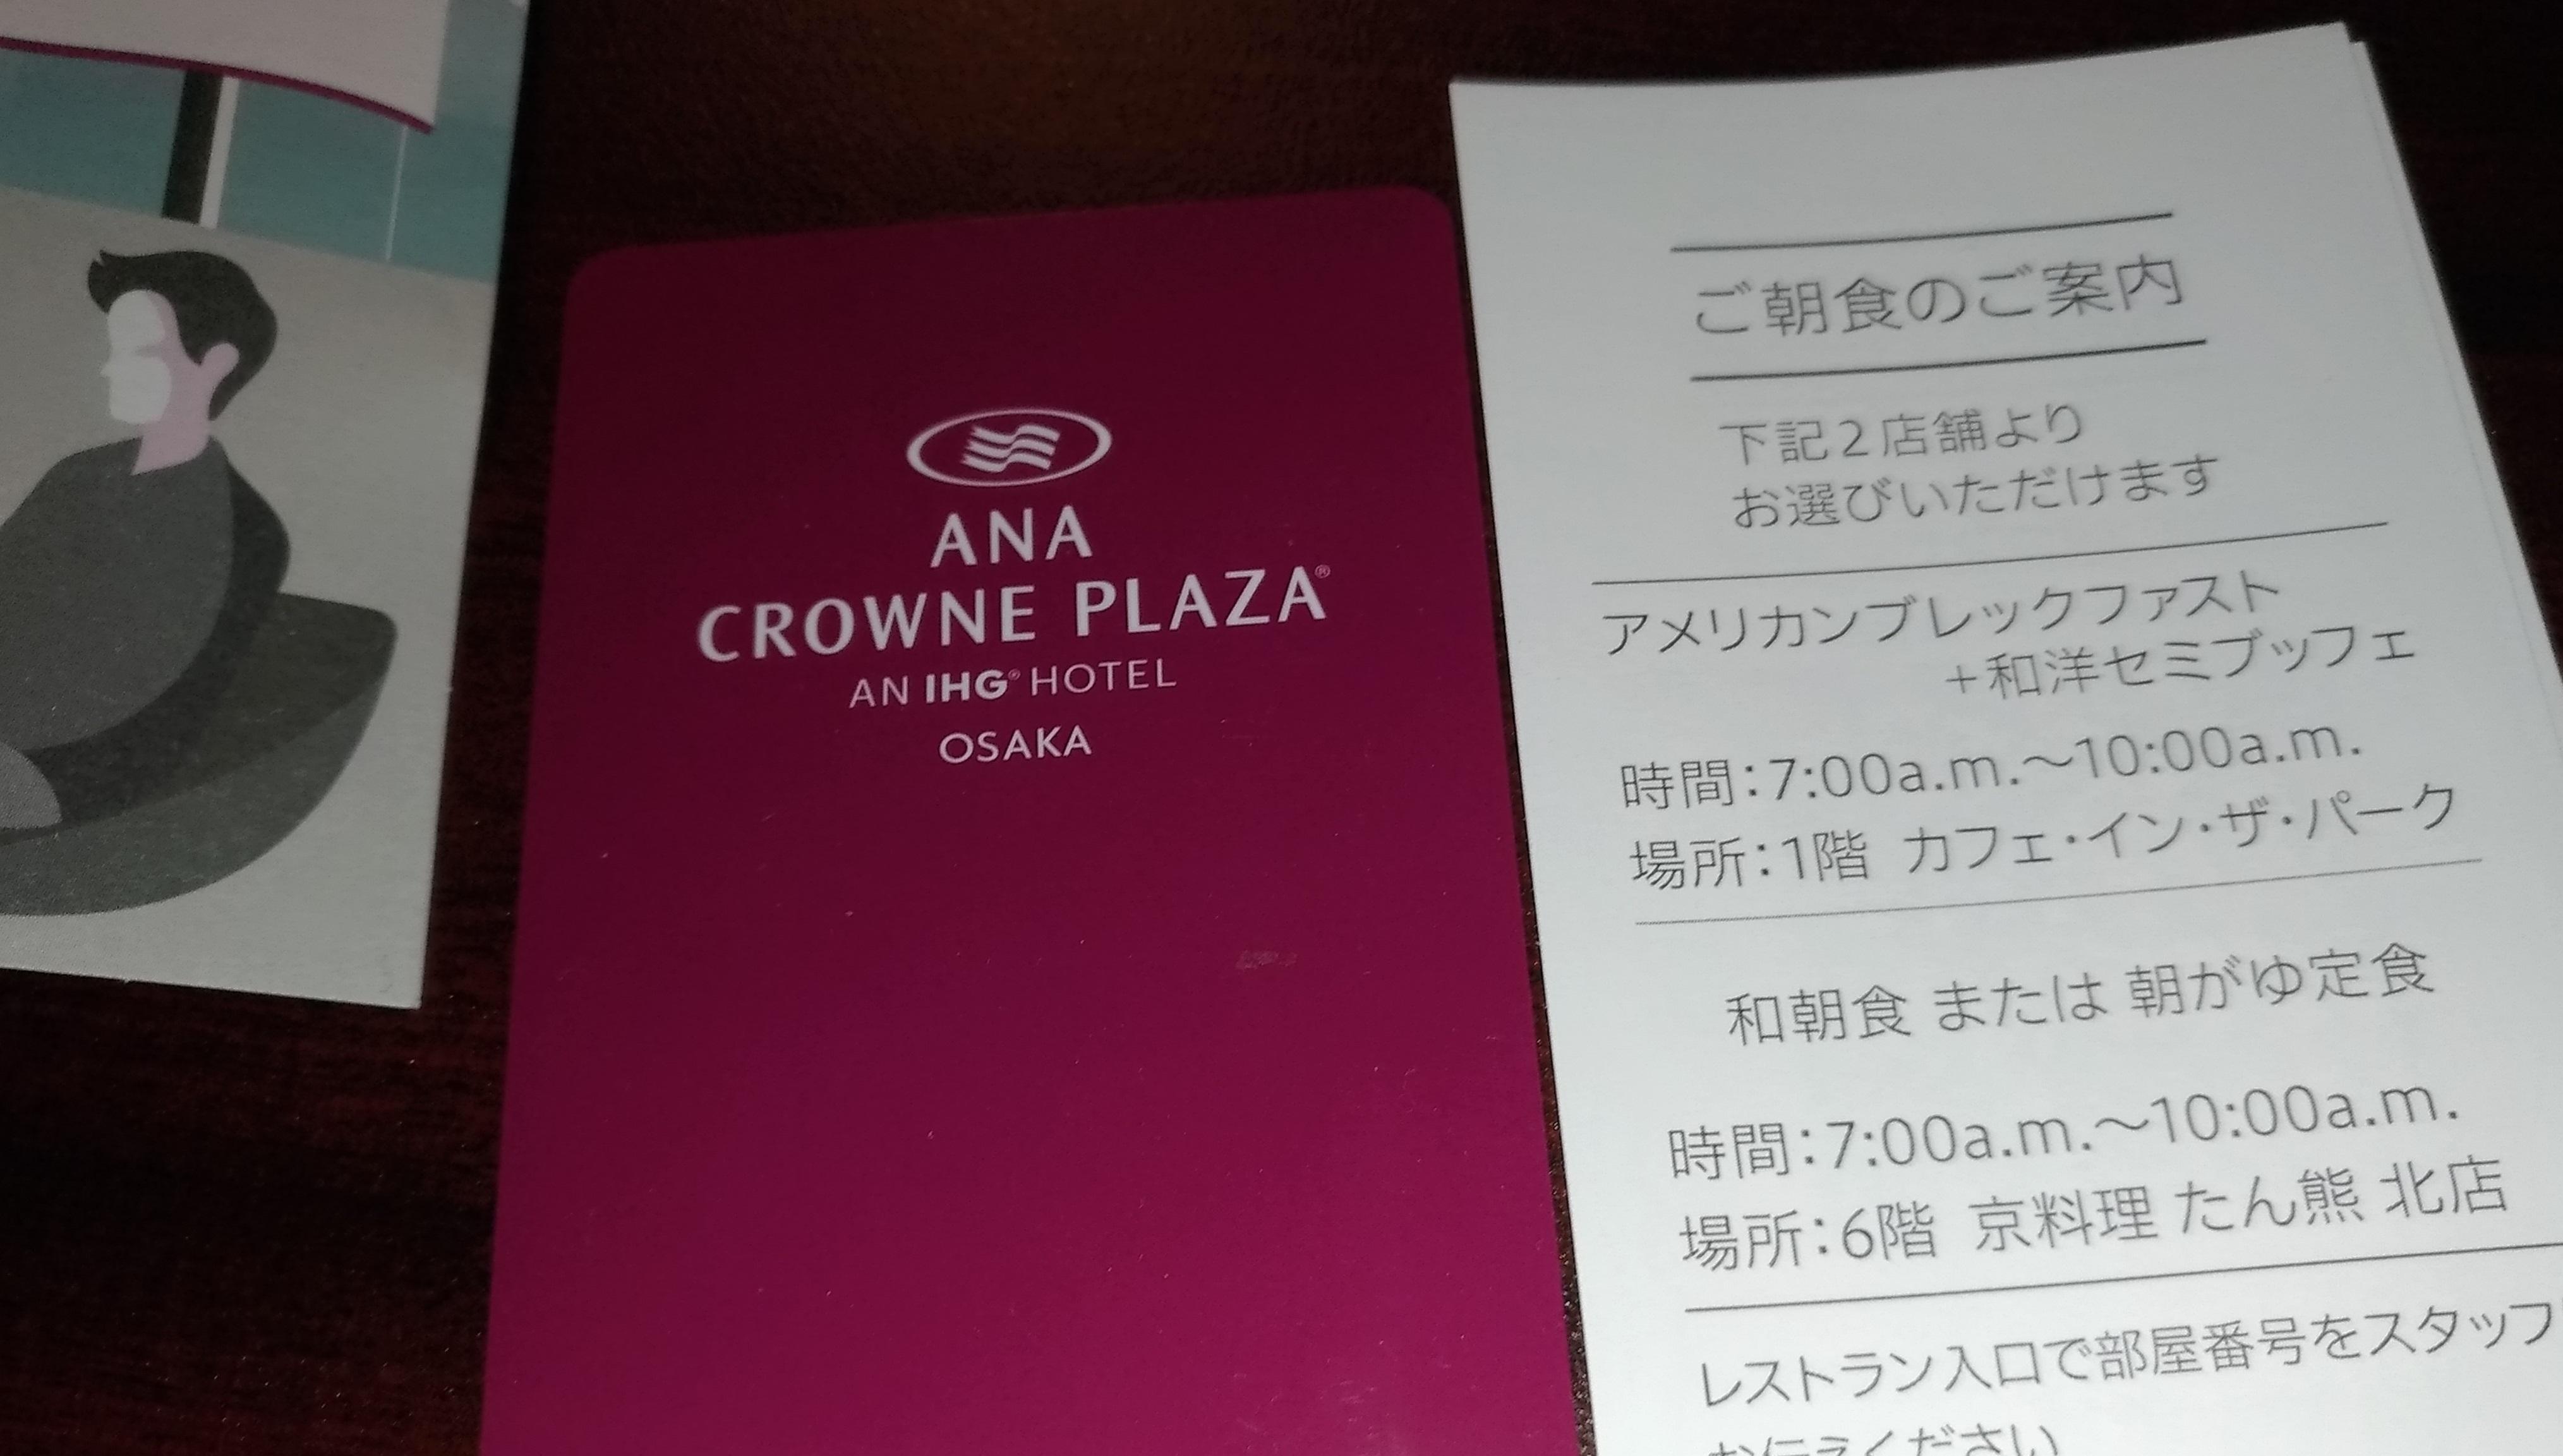 osaka_viking_hotel_ana_crownplaza_1120.jpg